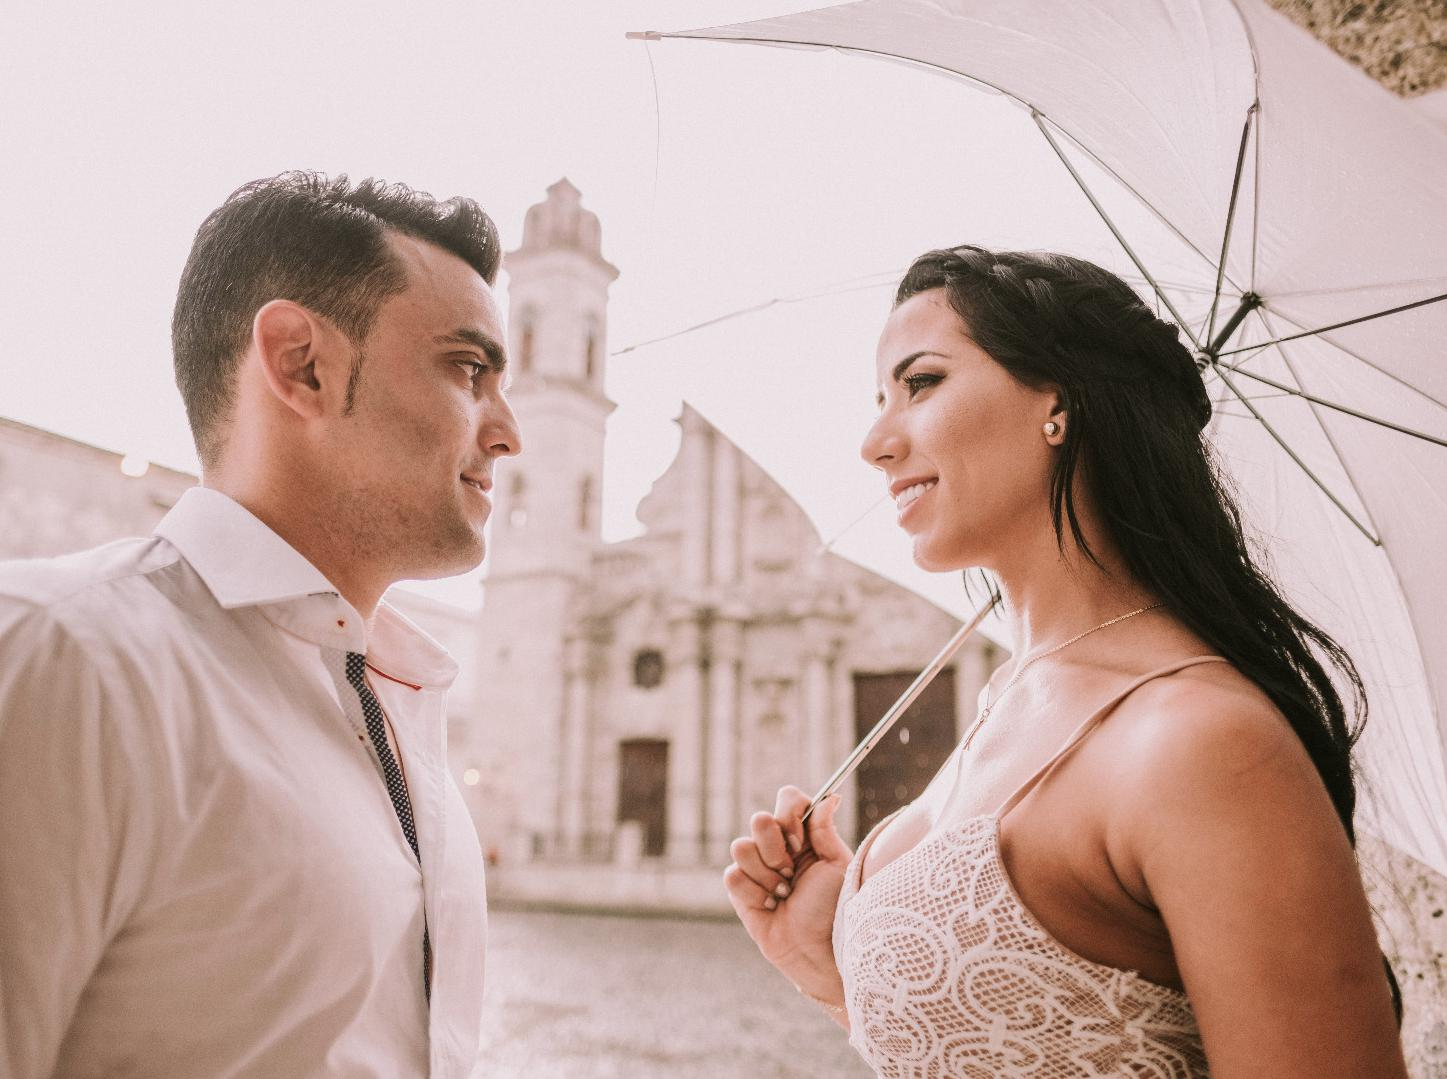 bodas-sin-clasificar-sin-tema-cuba-35241.jpg